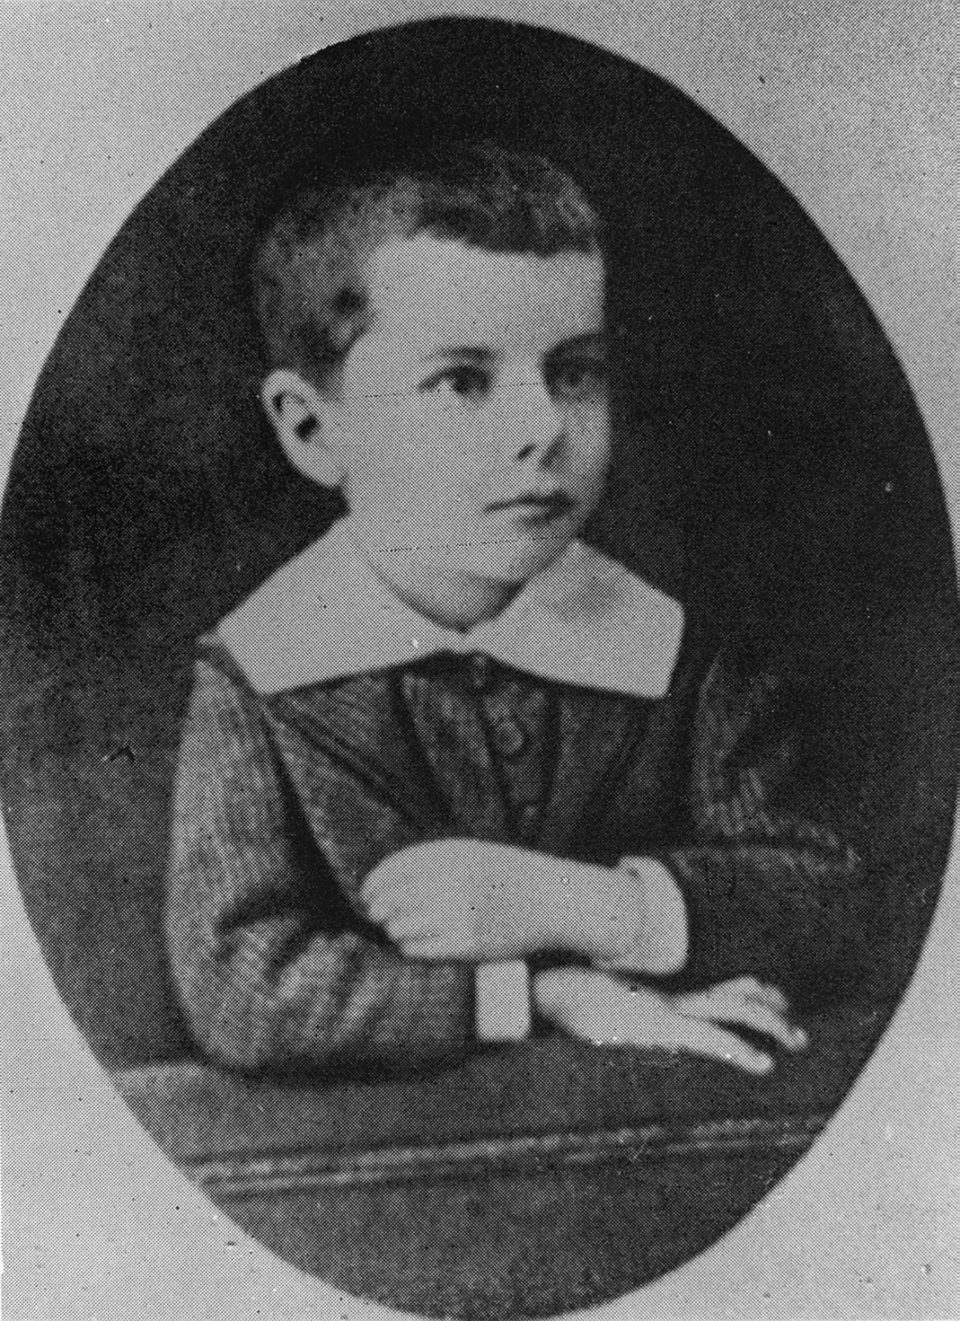 Béla Bartók (1881-1945): Rapsódias para Violino (Cello) e Piano, Canções Húngaras para Violino e Piano, Sonata para Violino e Piano BB 28 (Székely, Moore, László, Tusa, Szűcs, Szabadi, Beck) #BRTK140 Vol. 4 de 29